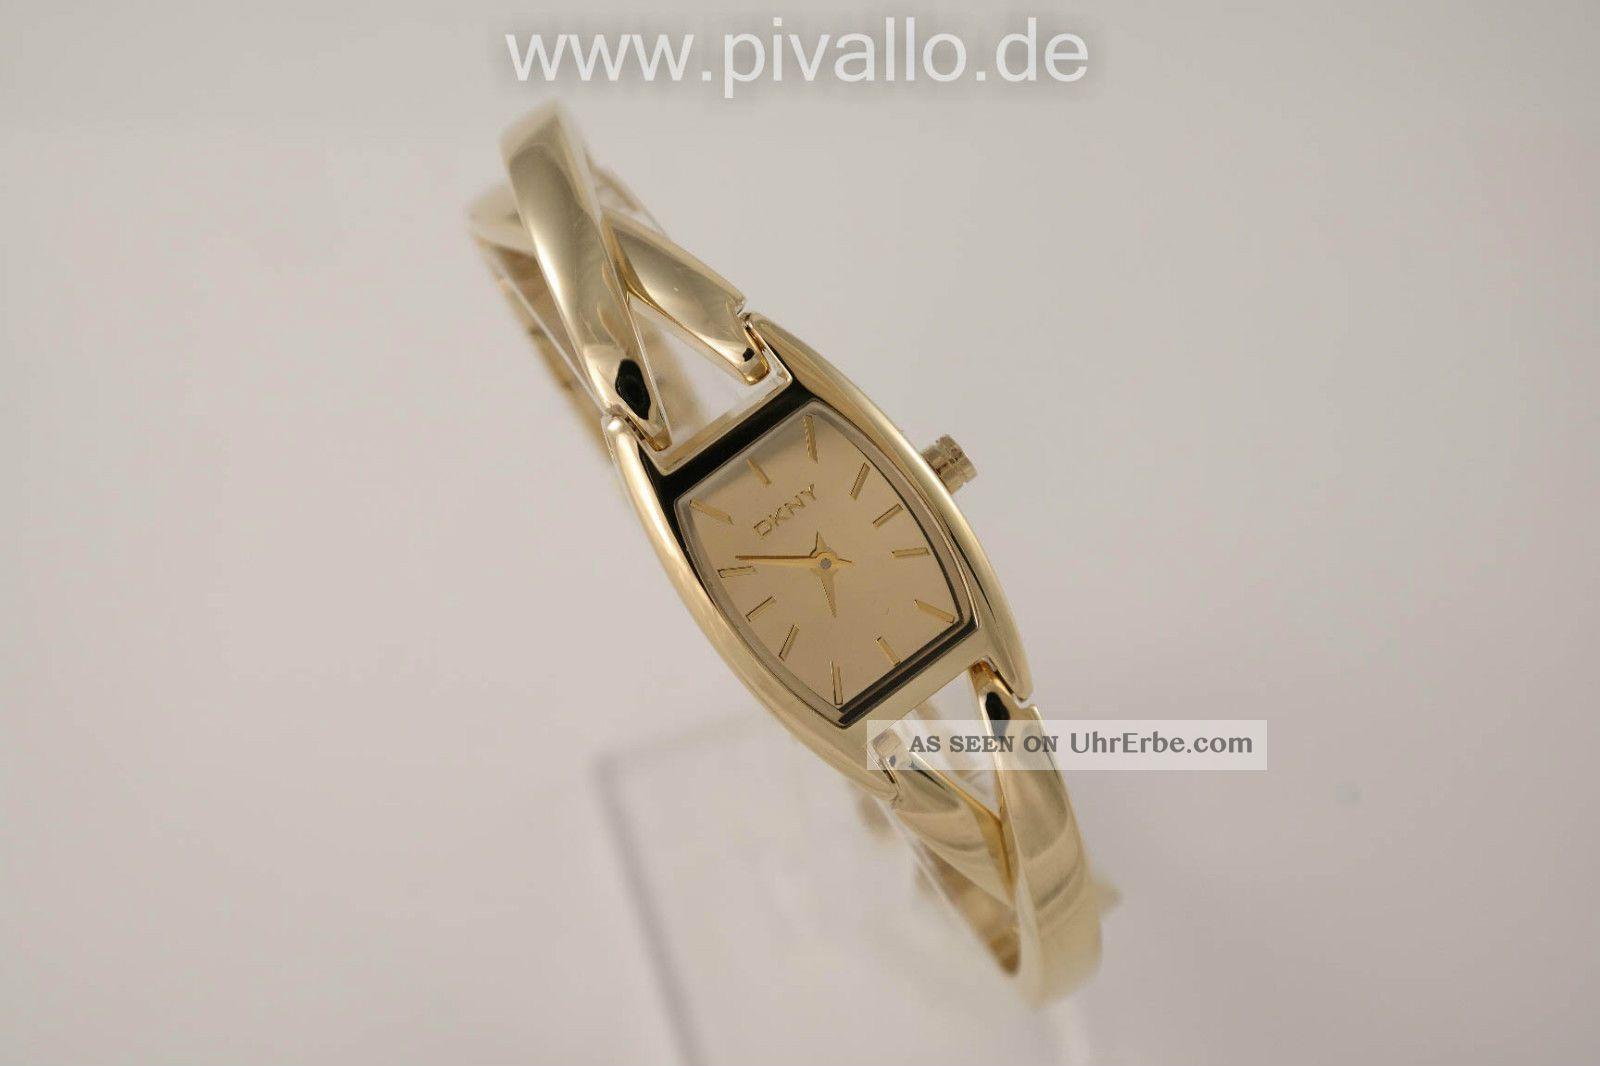 Dkny Donna Karan Ny Damenuhr / Damen Uhr Edelstahl Gold Ny8873 Armbanduhren Bild